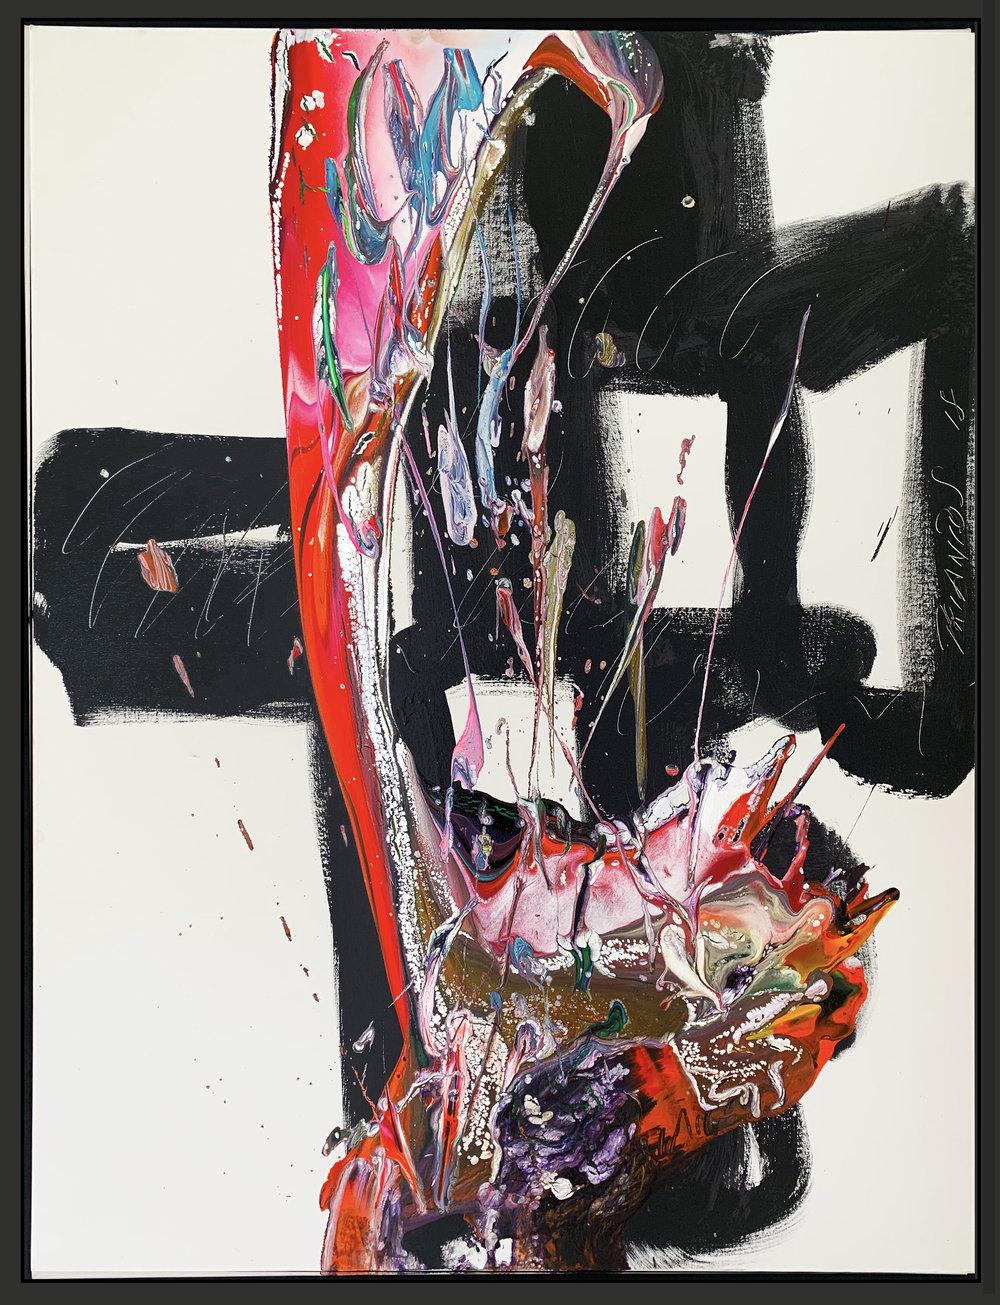 "Splash of Colour² #90, 2018, acrylic on canvas, 48"" x 36"" (122 x 91.4 cm)"